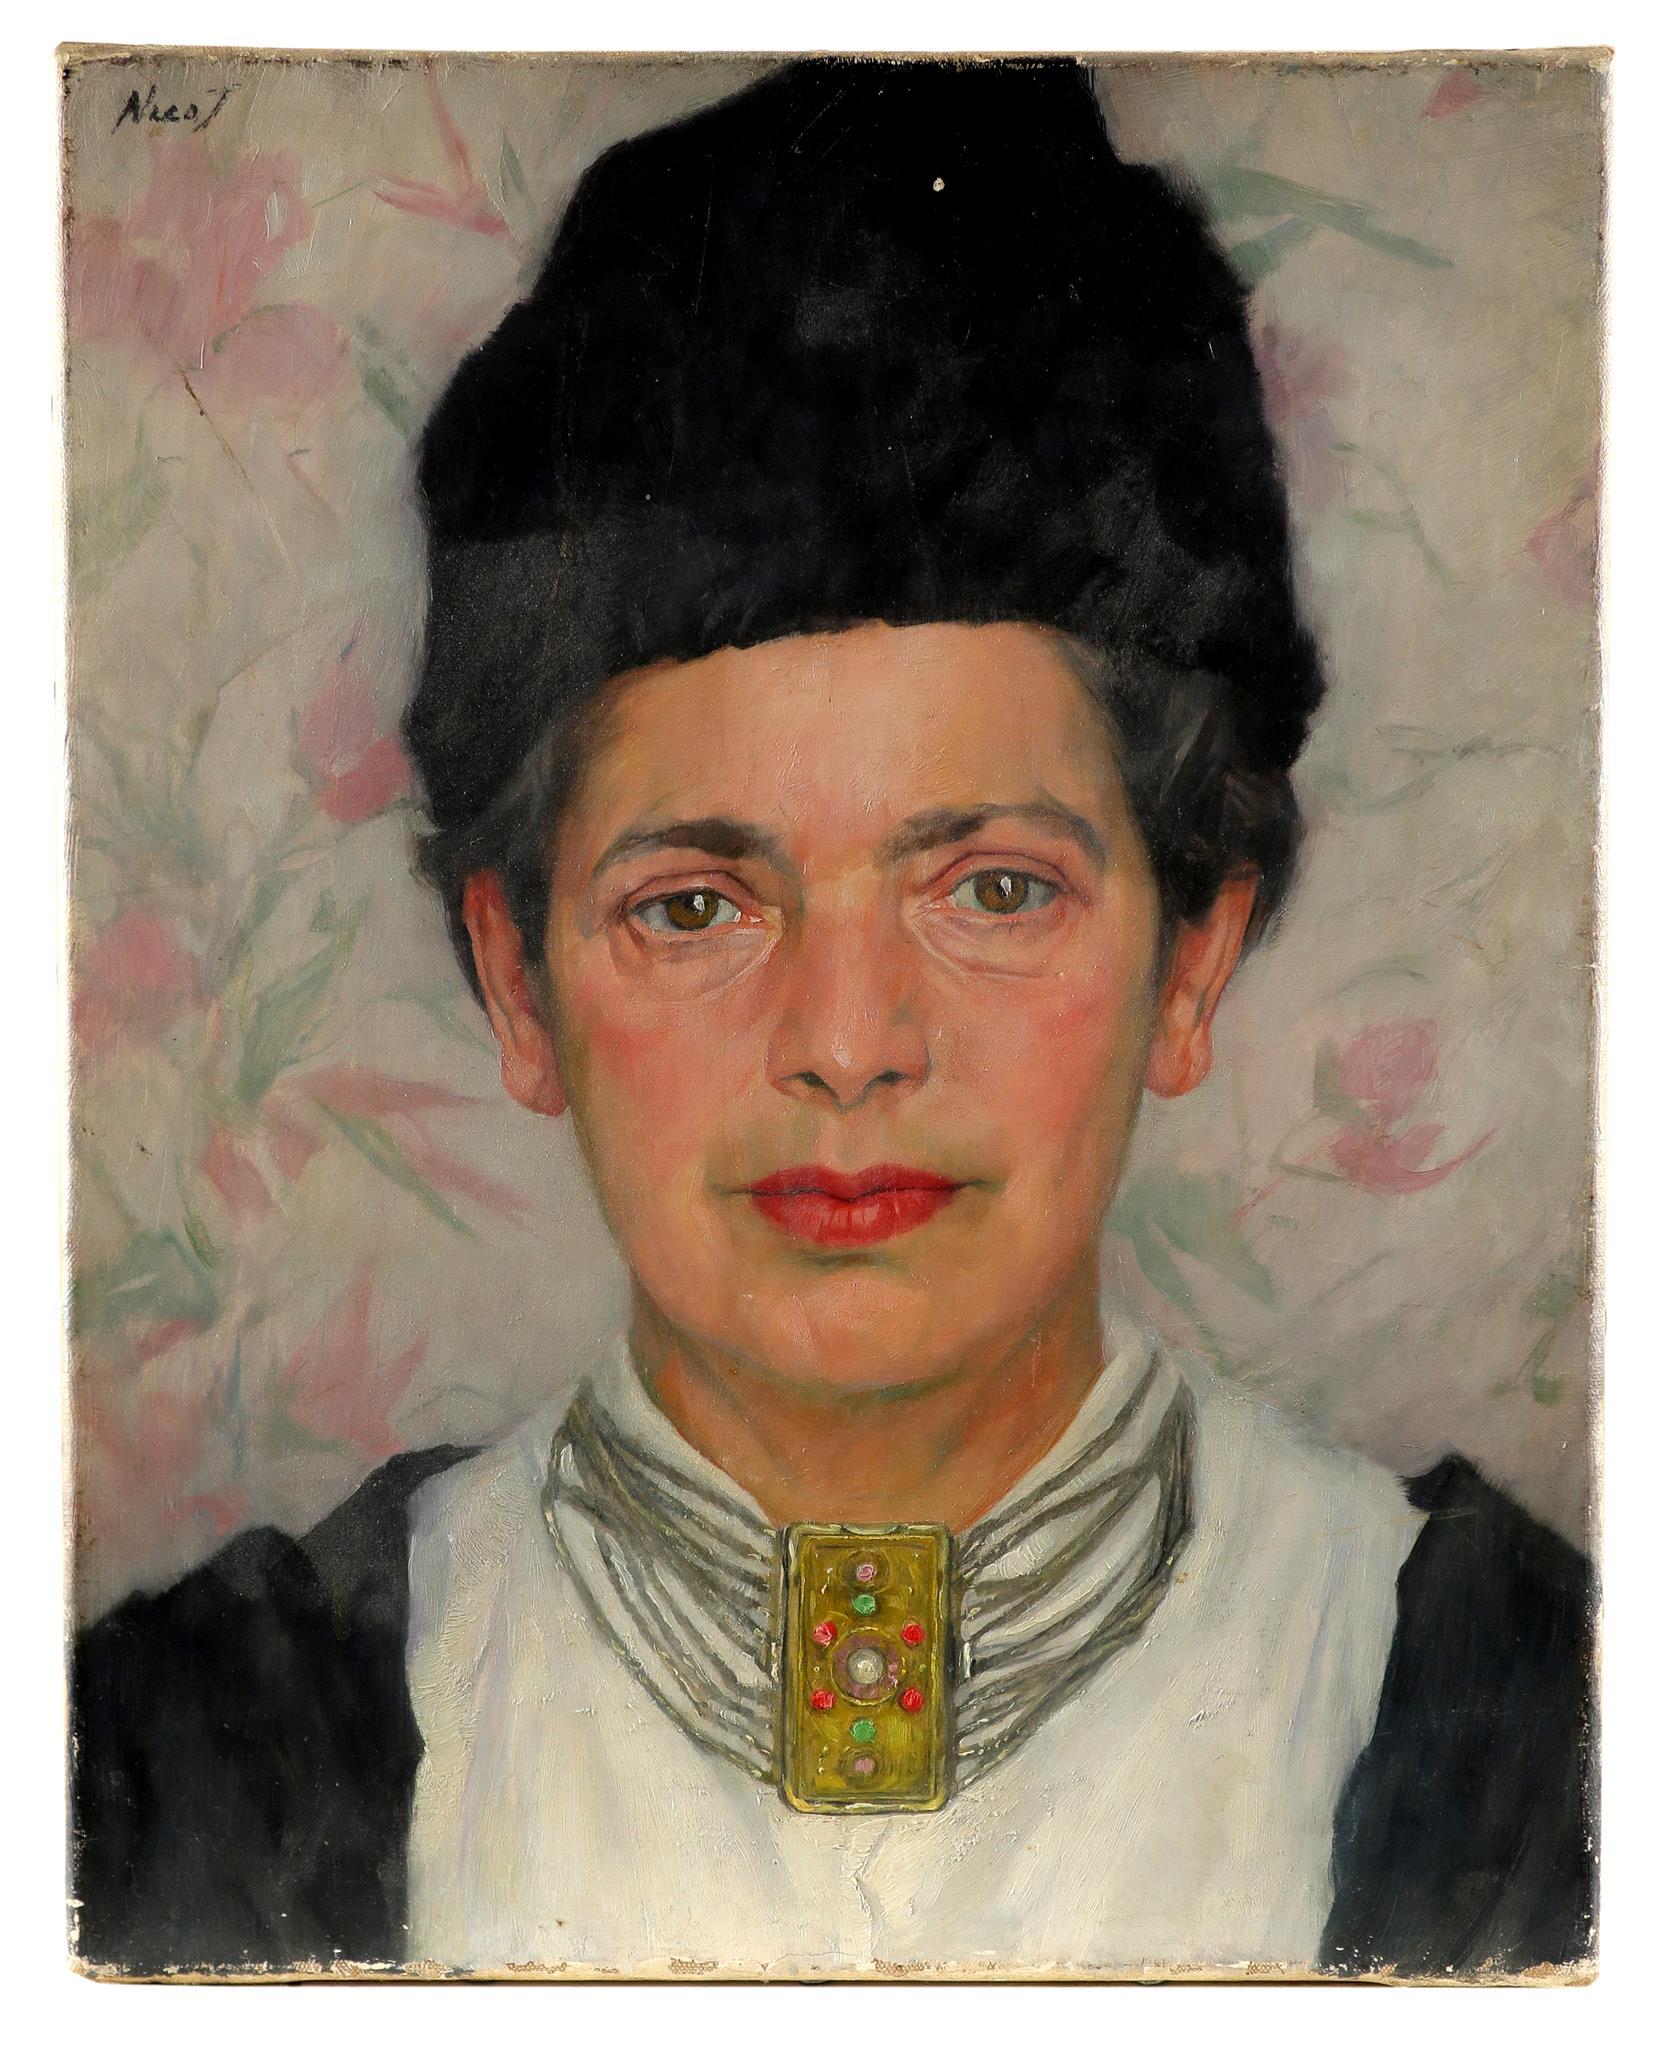 Russian School 20th Century Portrait of a woman, bust-length, in a fur hat Signed NicoJ (upper left)